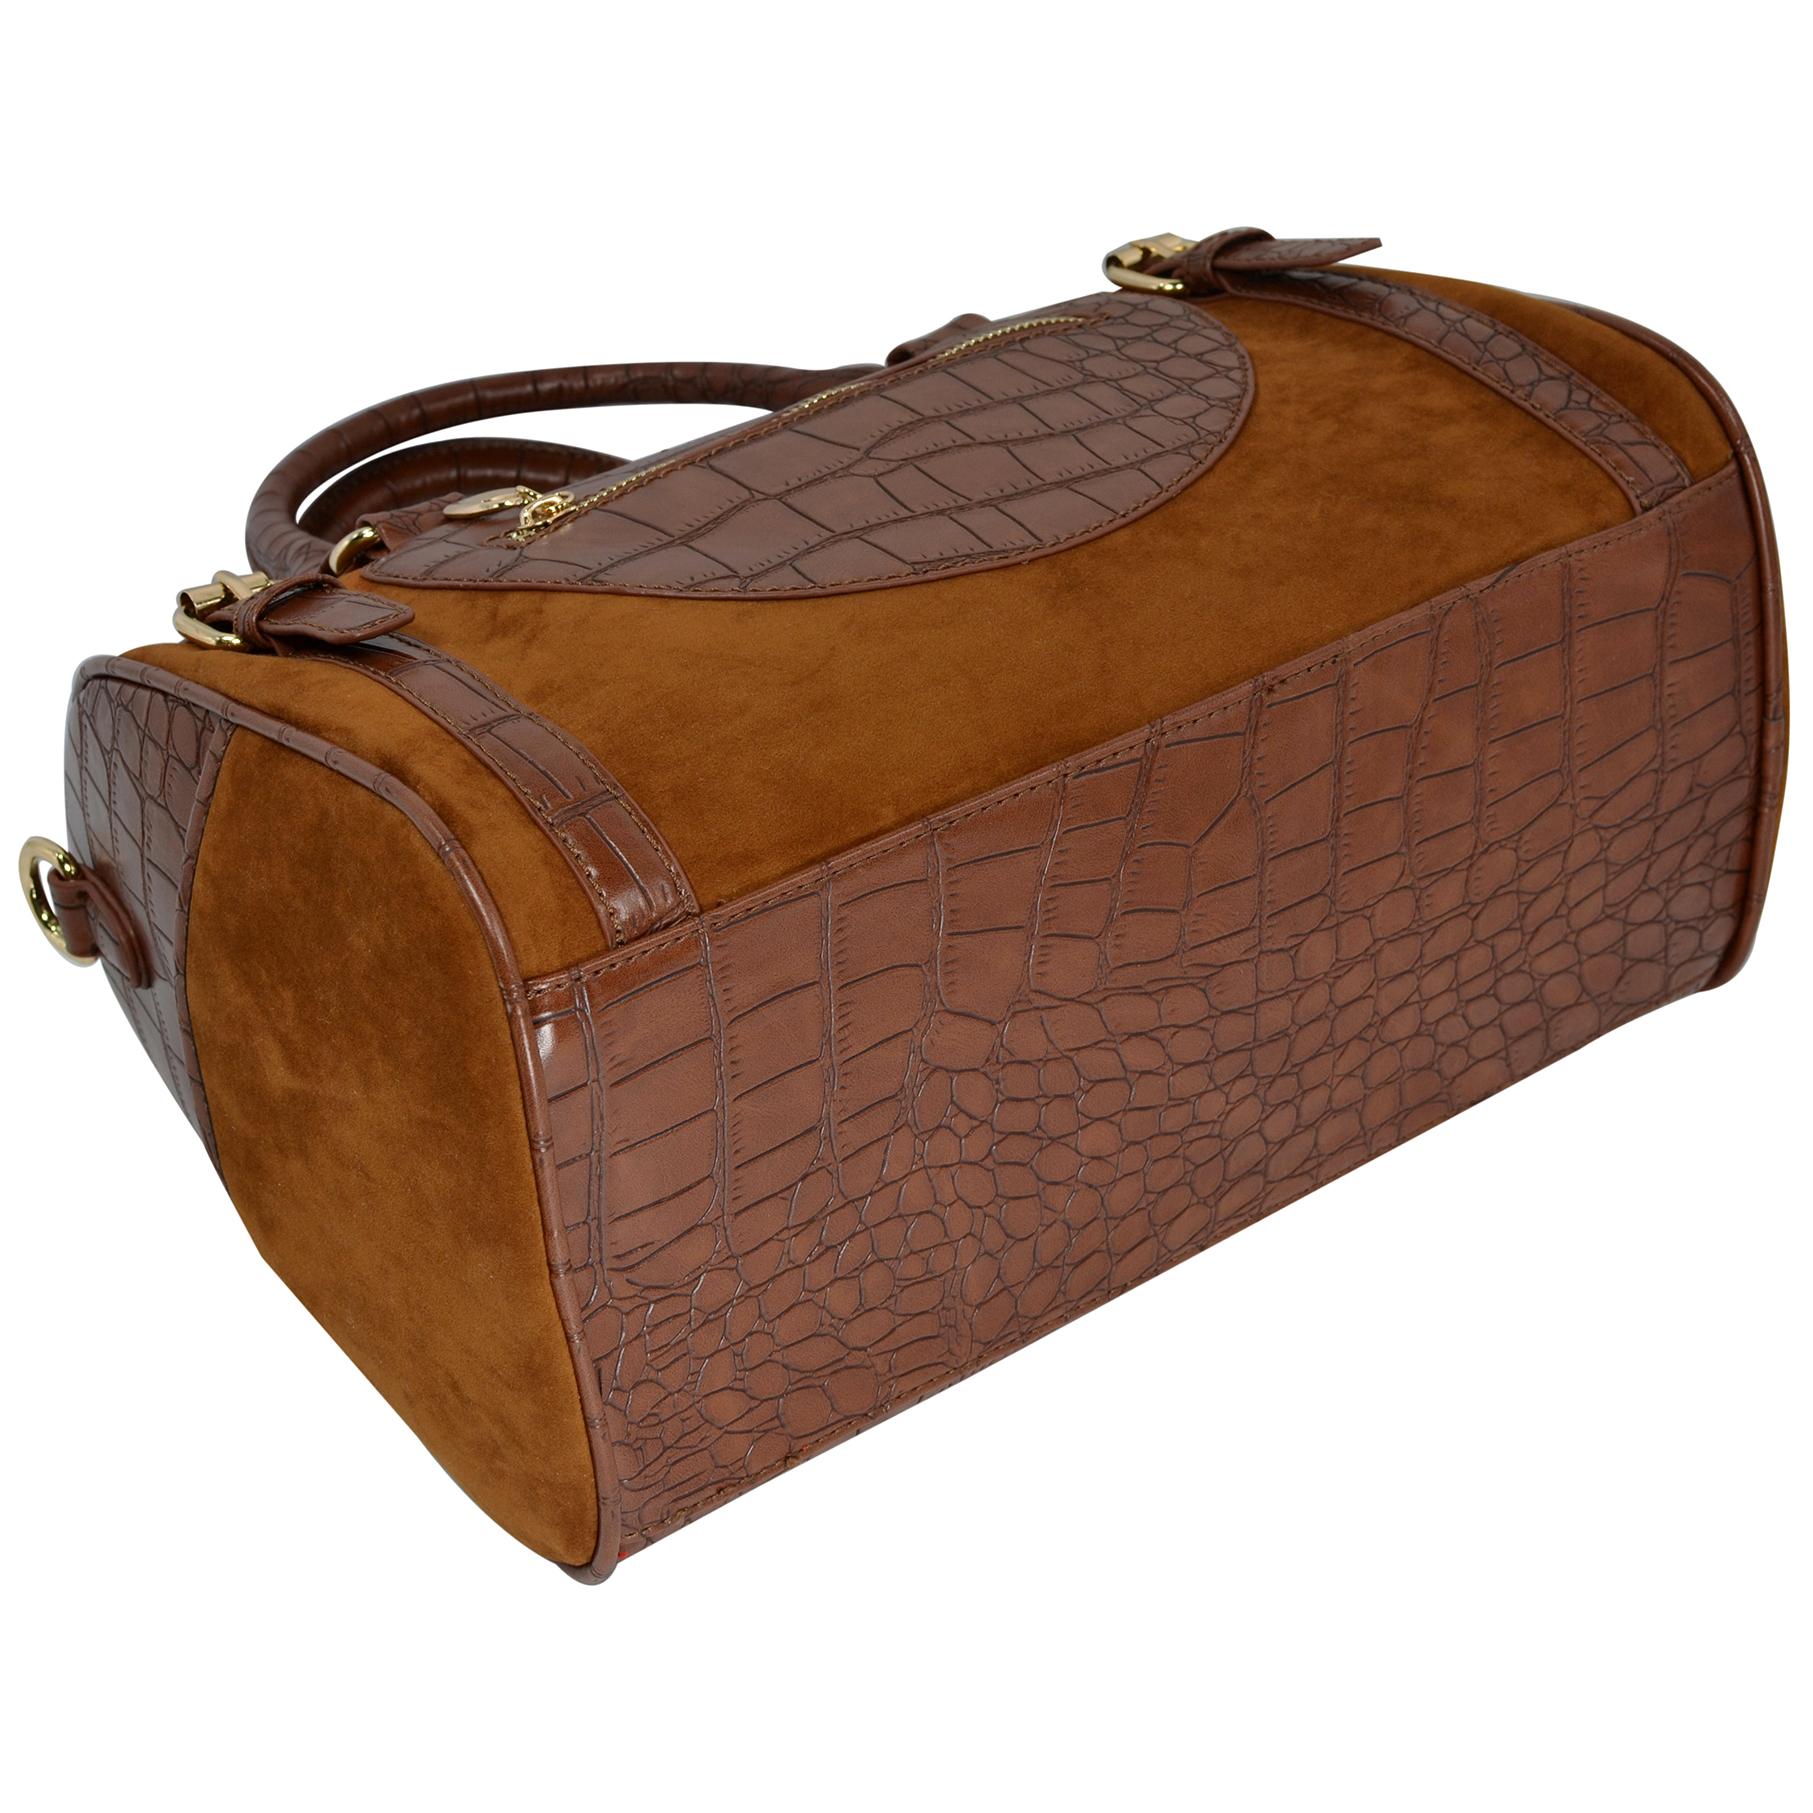 mg-collection-brandi-brown-bowler-handbag-tb-h0339brn-6.jpg